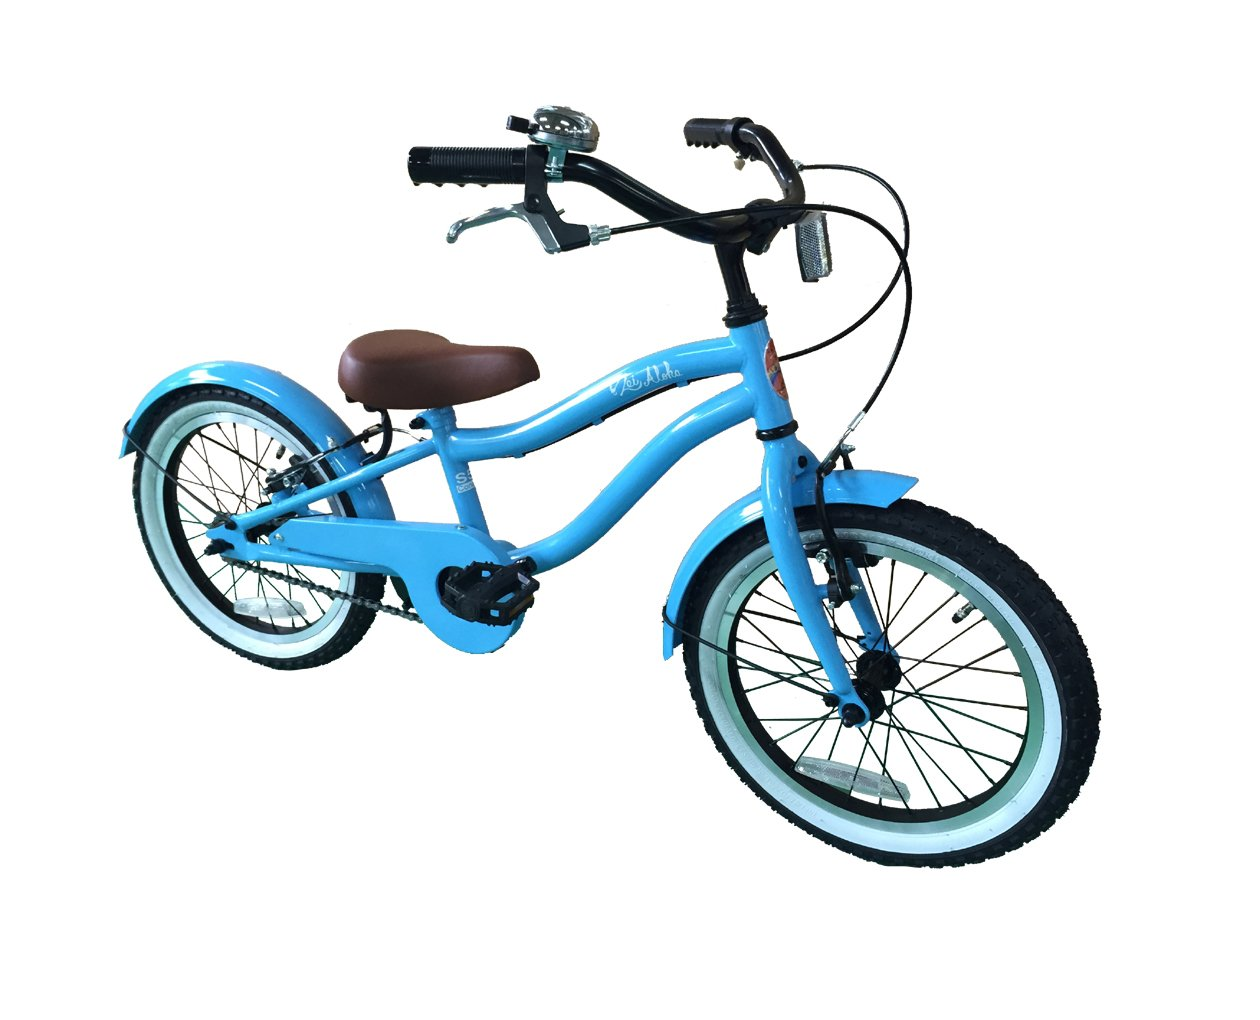 LeiAloha ~ レイアロハ ~ 16インチ BL <完成品> + 今なら自転車カバープレゼント! 【オリジナルブランド限定モデル】 B072DWCCCX